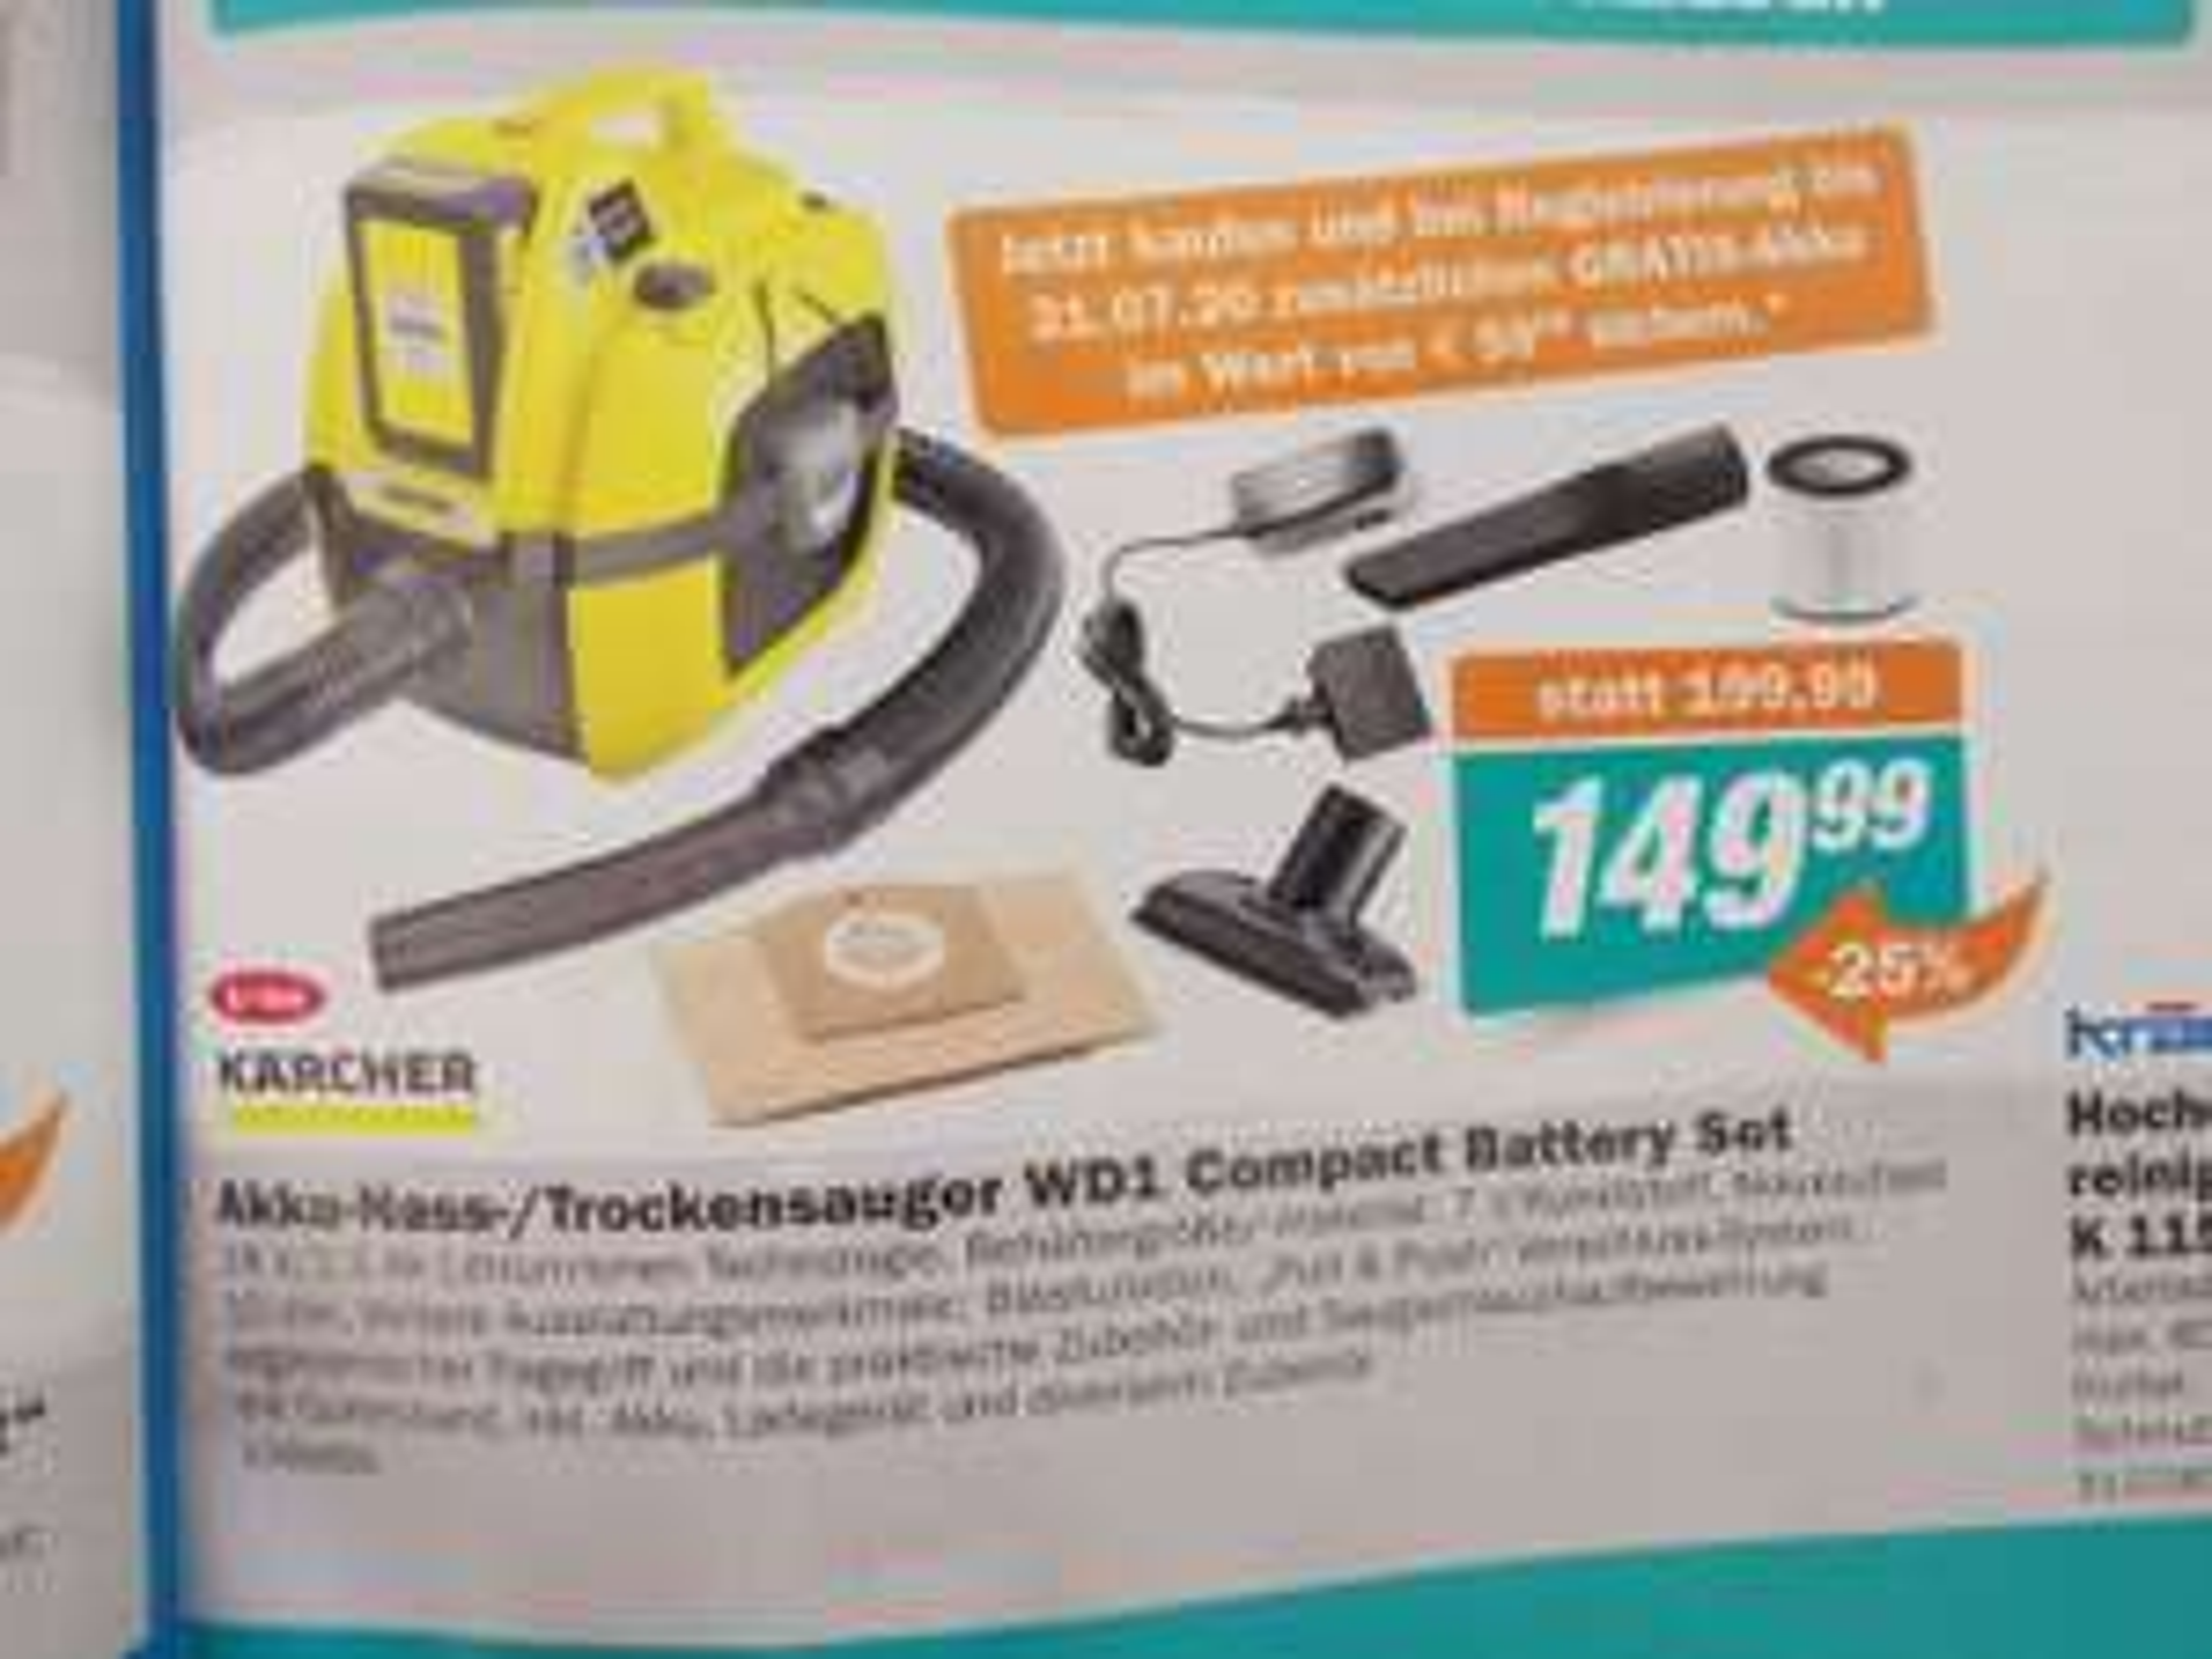 [Let's Do it] Kärcher WD1 Compact Battery Set